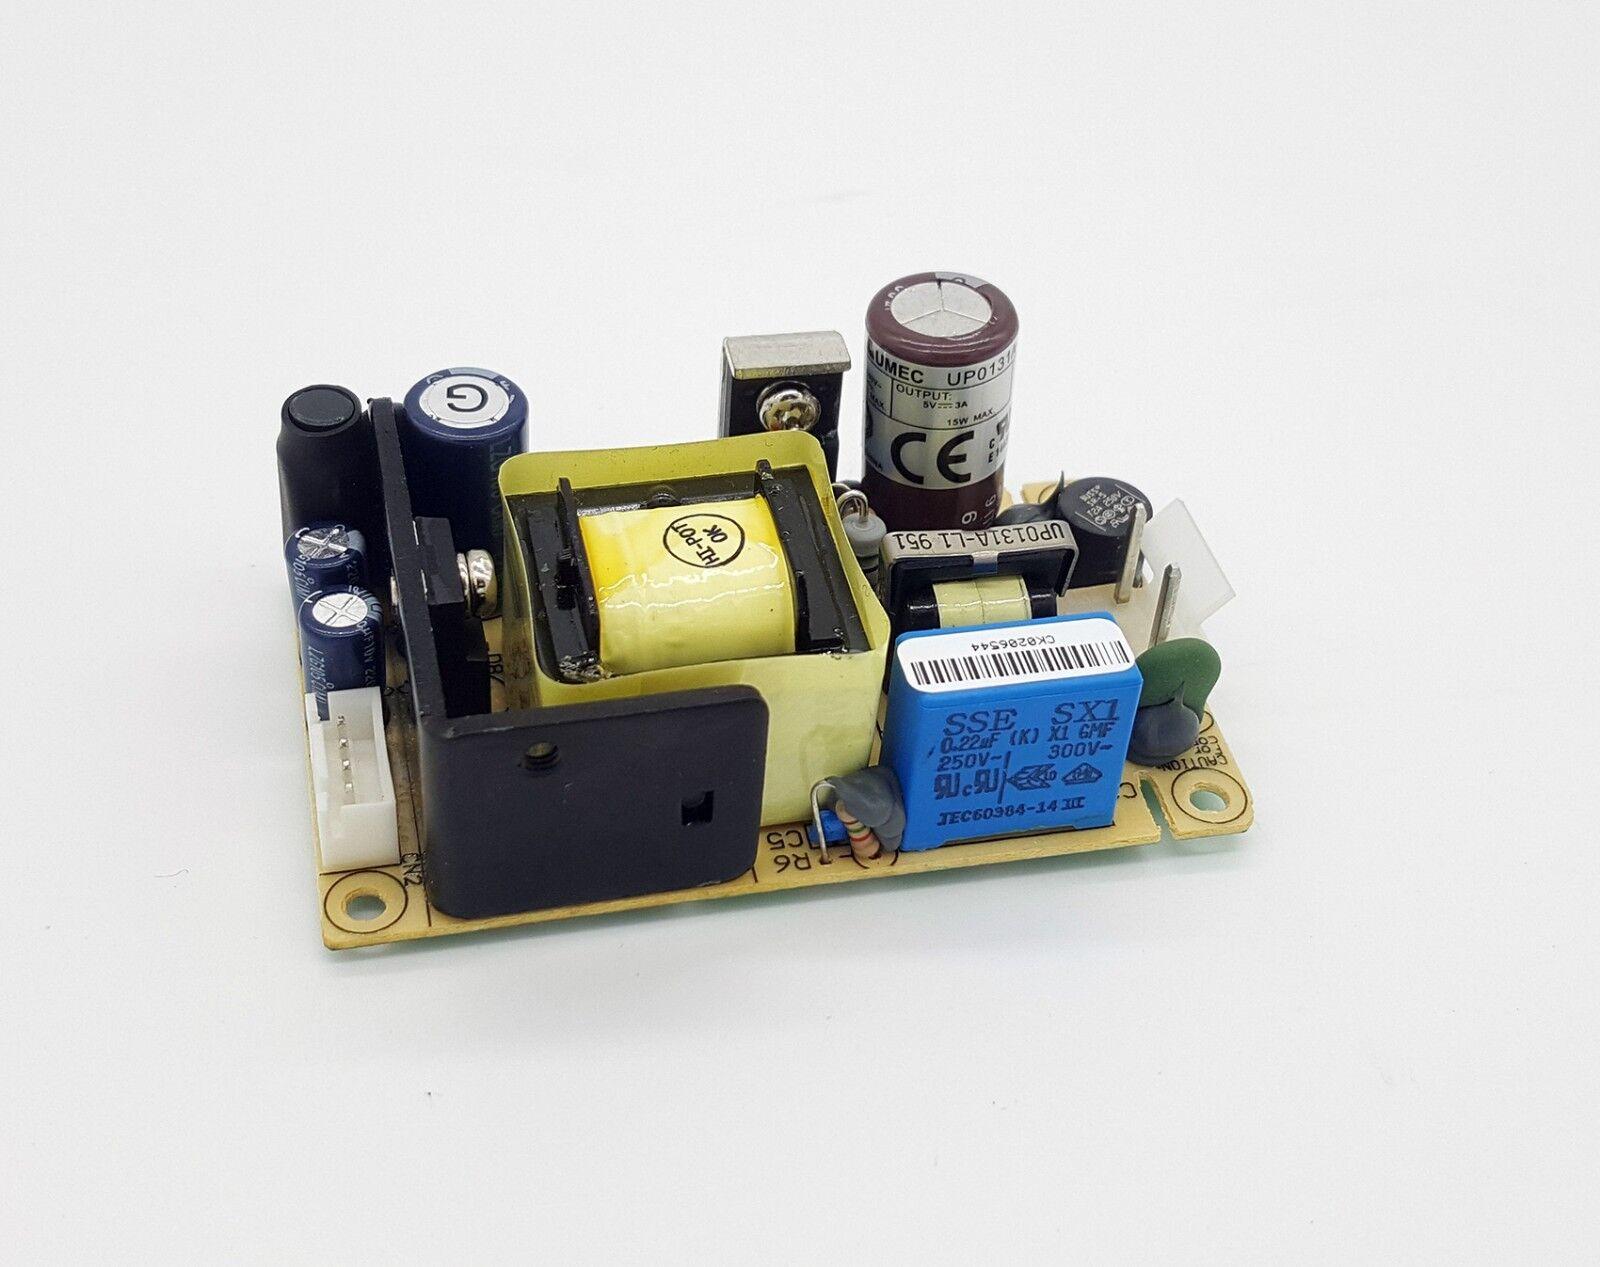 Utini ac dc Power Source 5V 3A 15W Original Switch Power Supply RS-15-5 Miniature Size 300VAC Input Surge SMPS PSU 5V DC